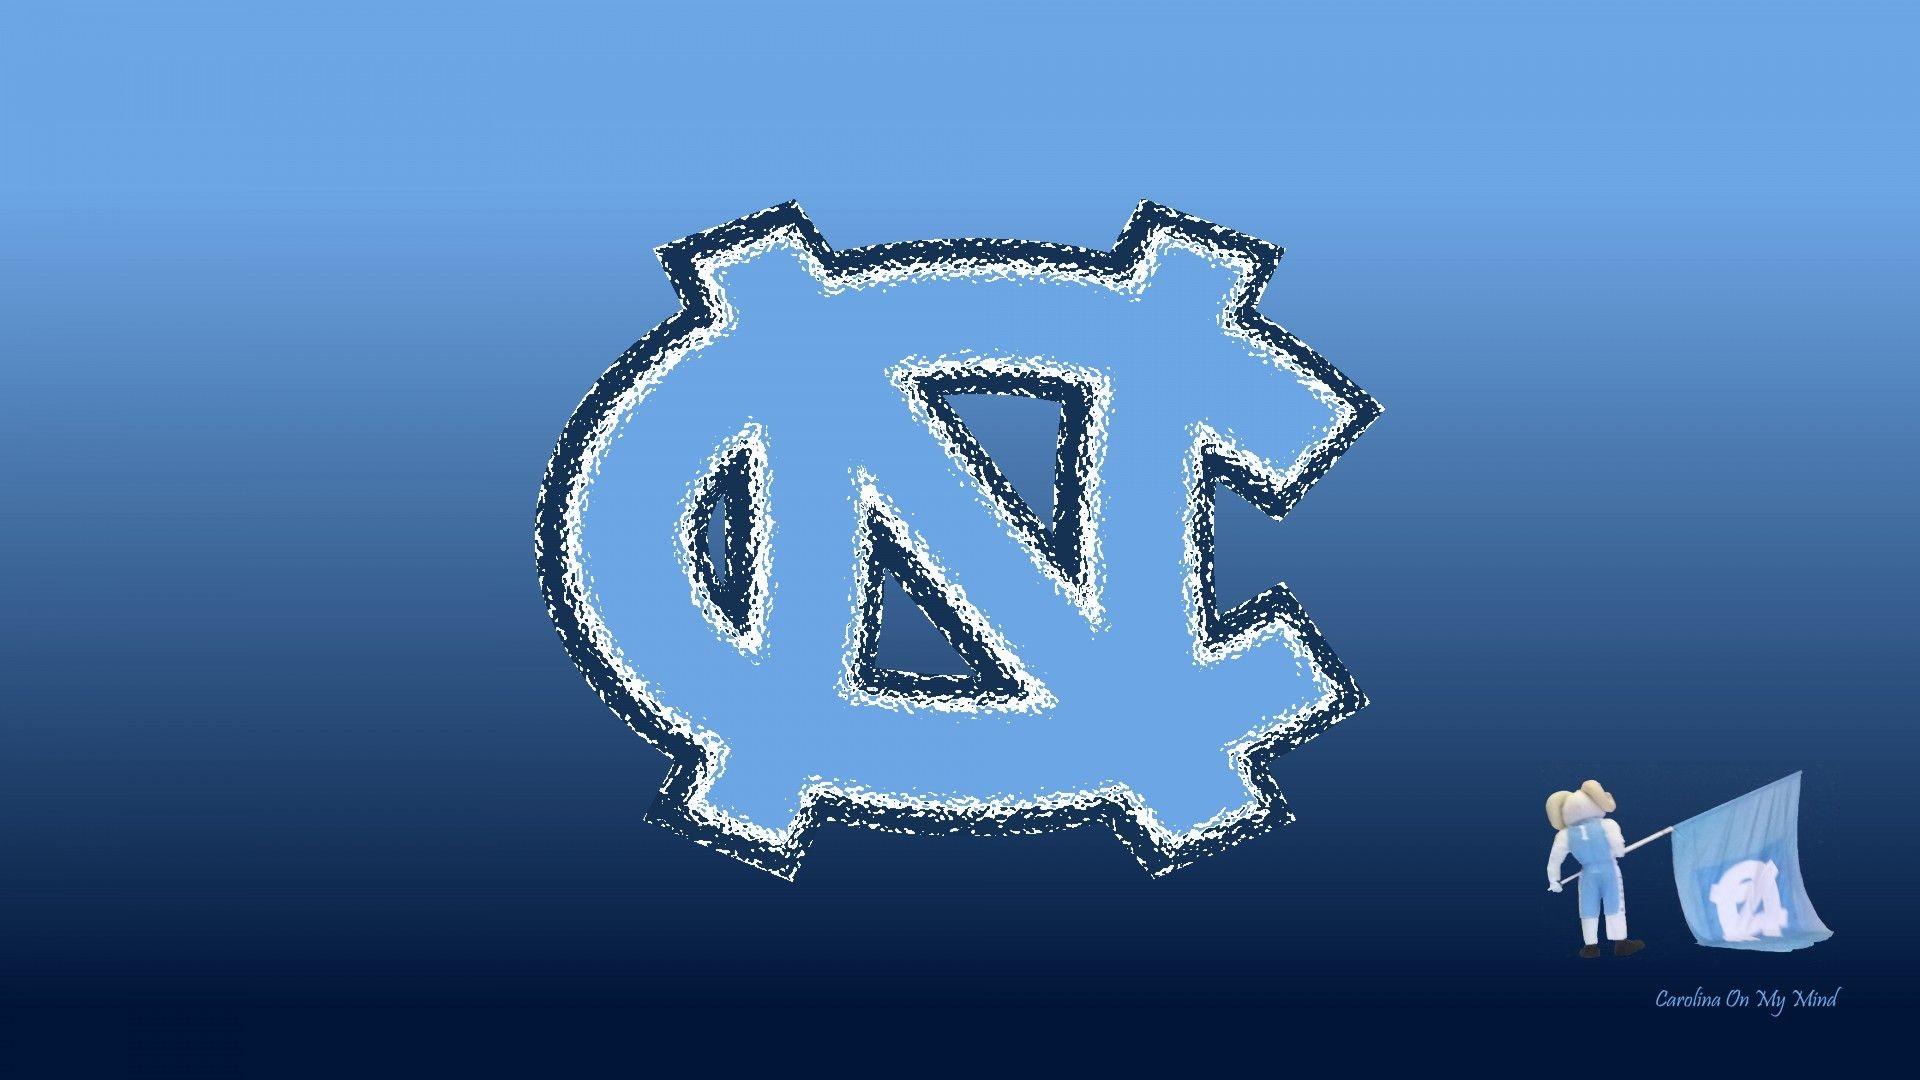 Media Day University of North Carolina Tar Heels North Carolina Tar Heels  Basketball Wallpapers Wallpapers)